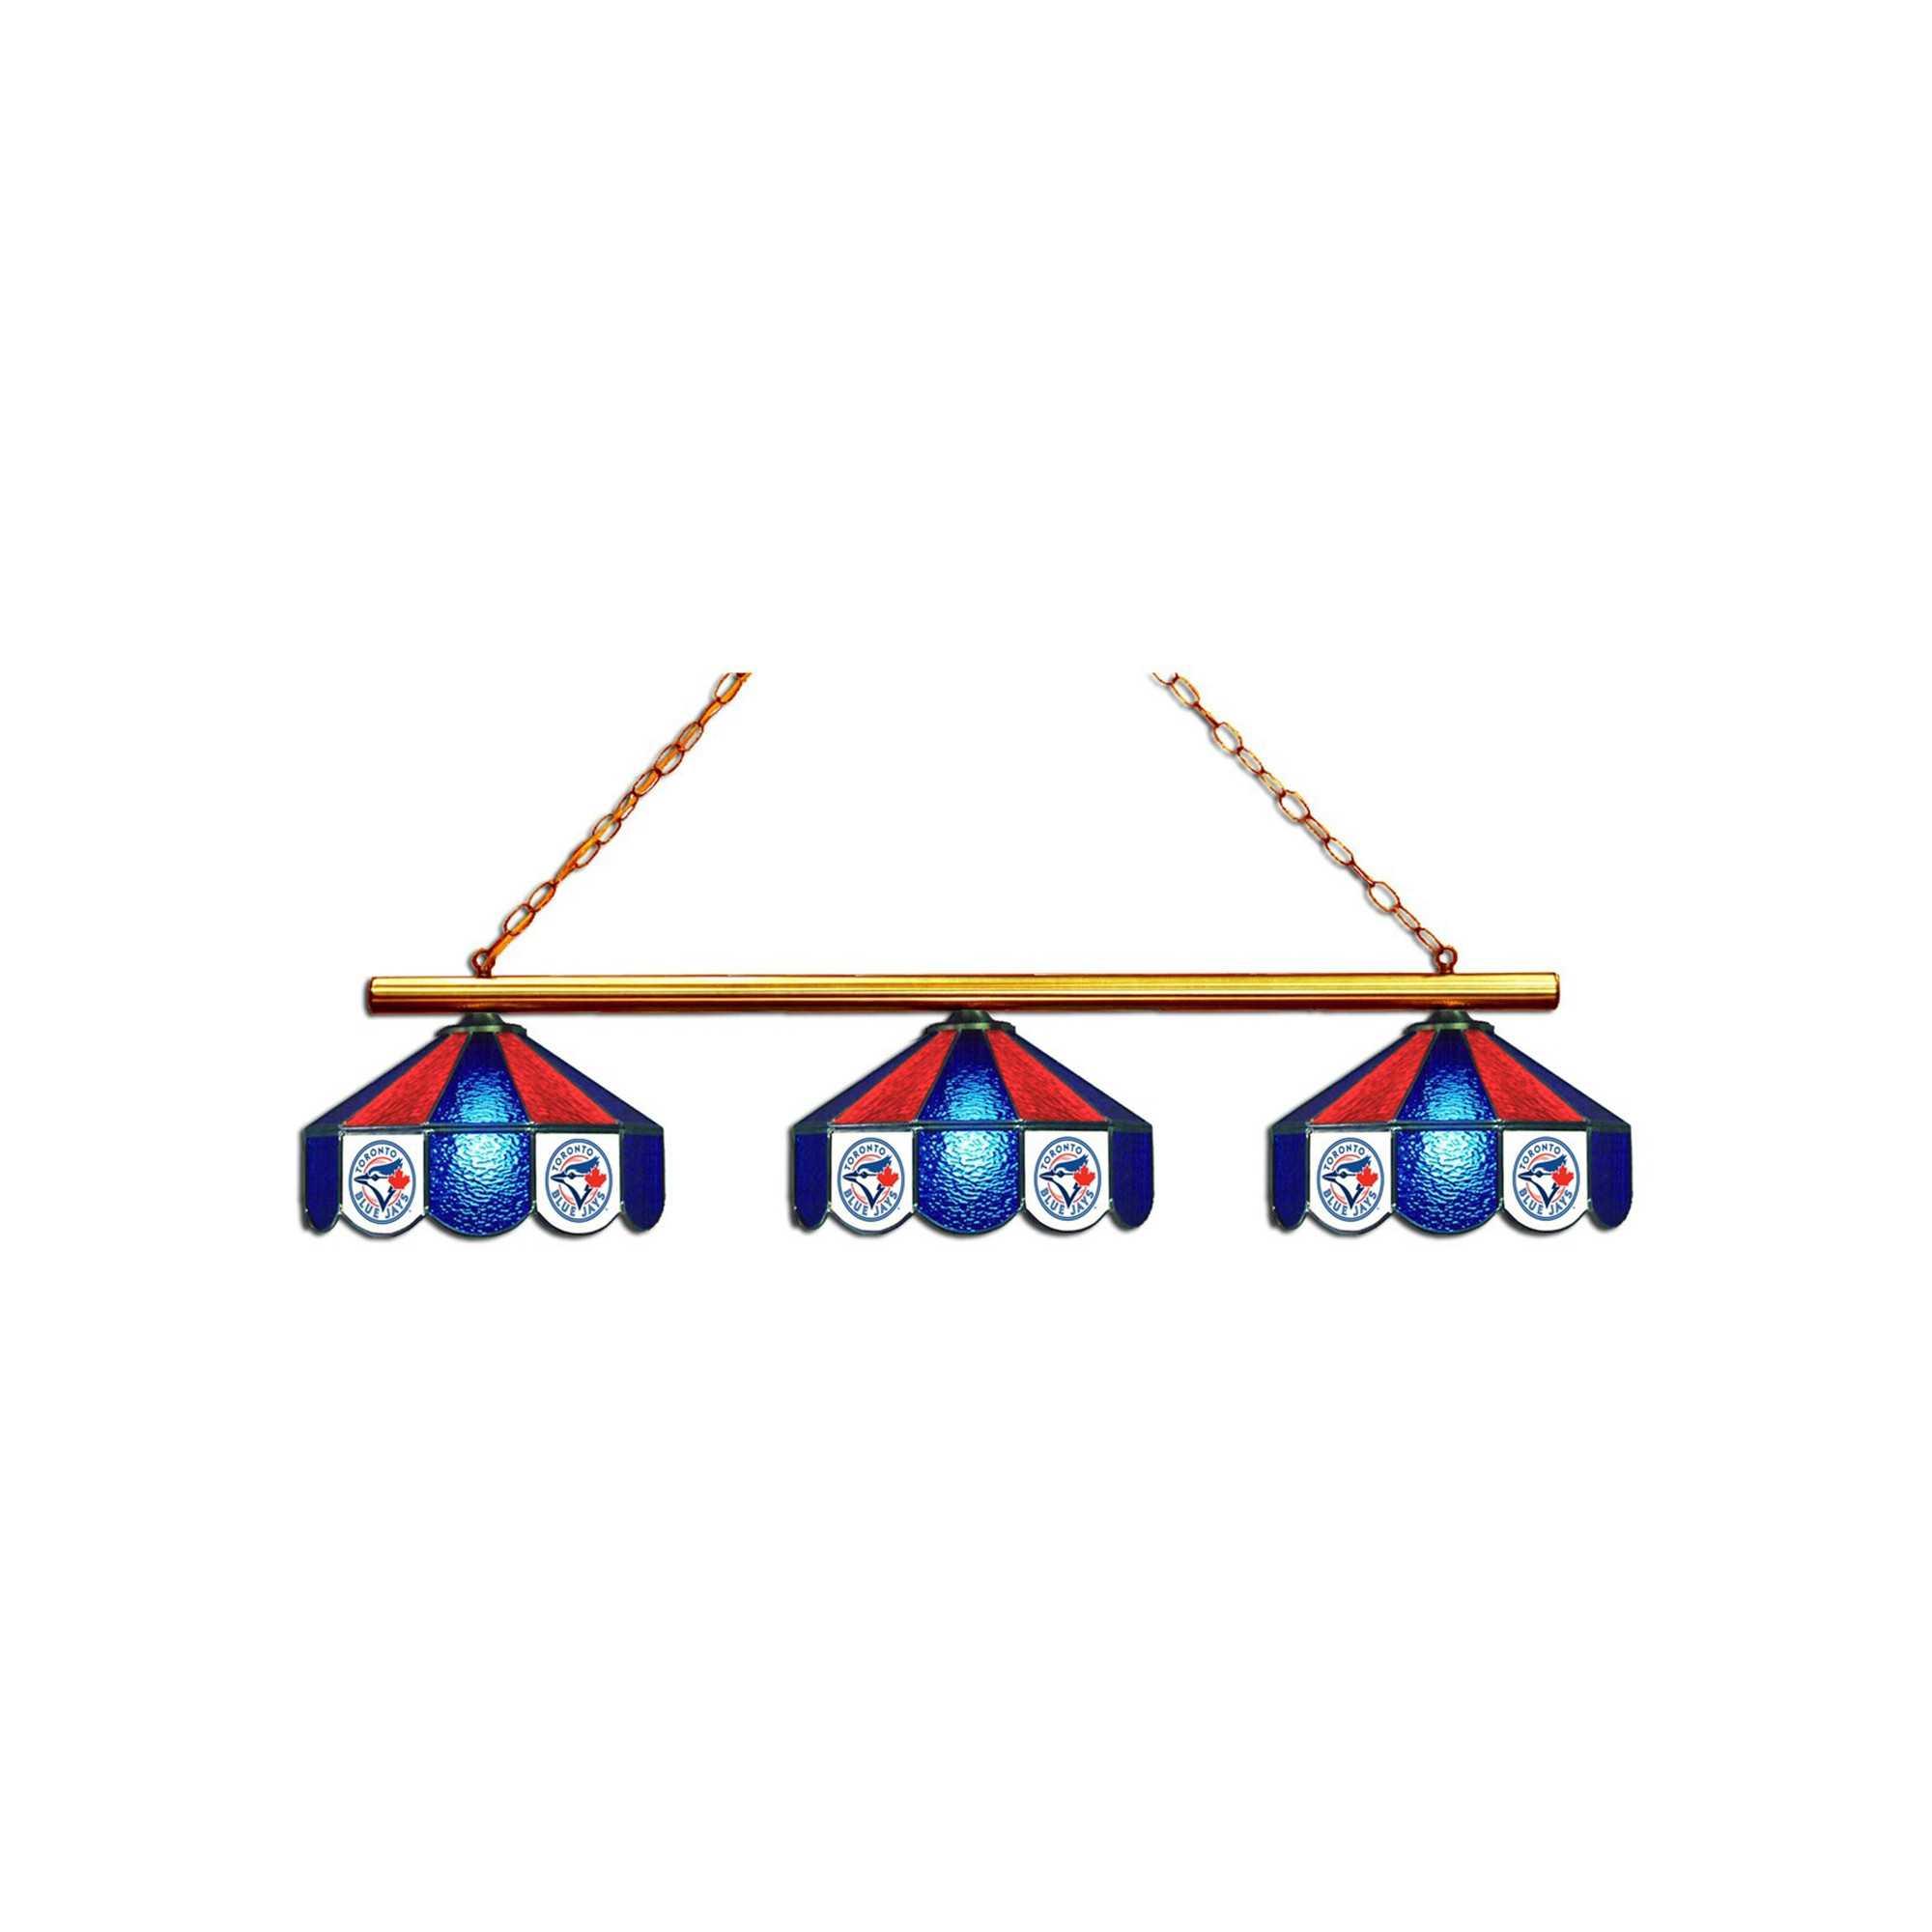 TORONTO BLUE JAYS 3 SHADE GLASS LAMP